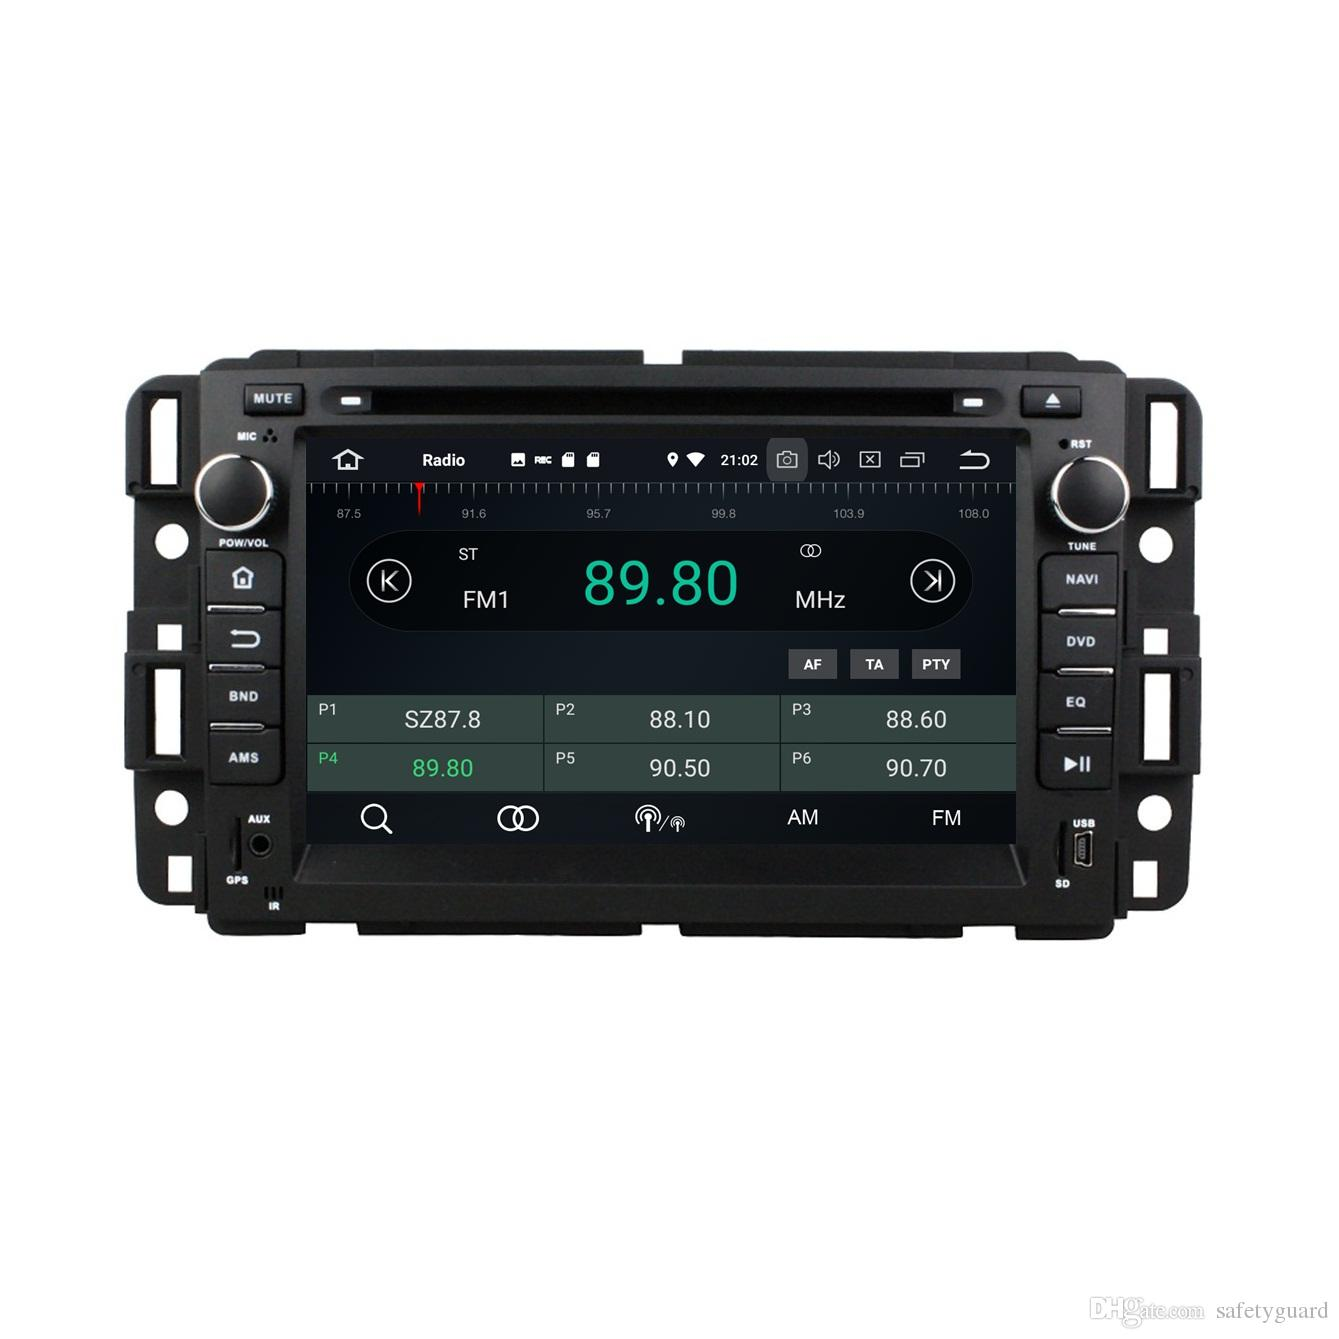 "4GB+64GB Android 8.0 Octa Core 7"" Car DVD Player for GMC Yukon Tahoe 2007 2008 2009 2010 2011 2012 RDS Radio Bluetooth WIFI USB Mirror-link"